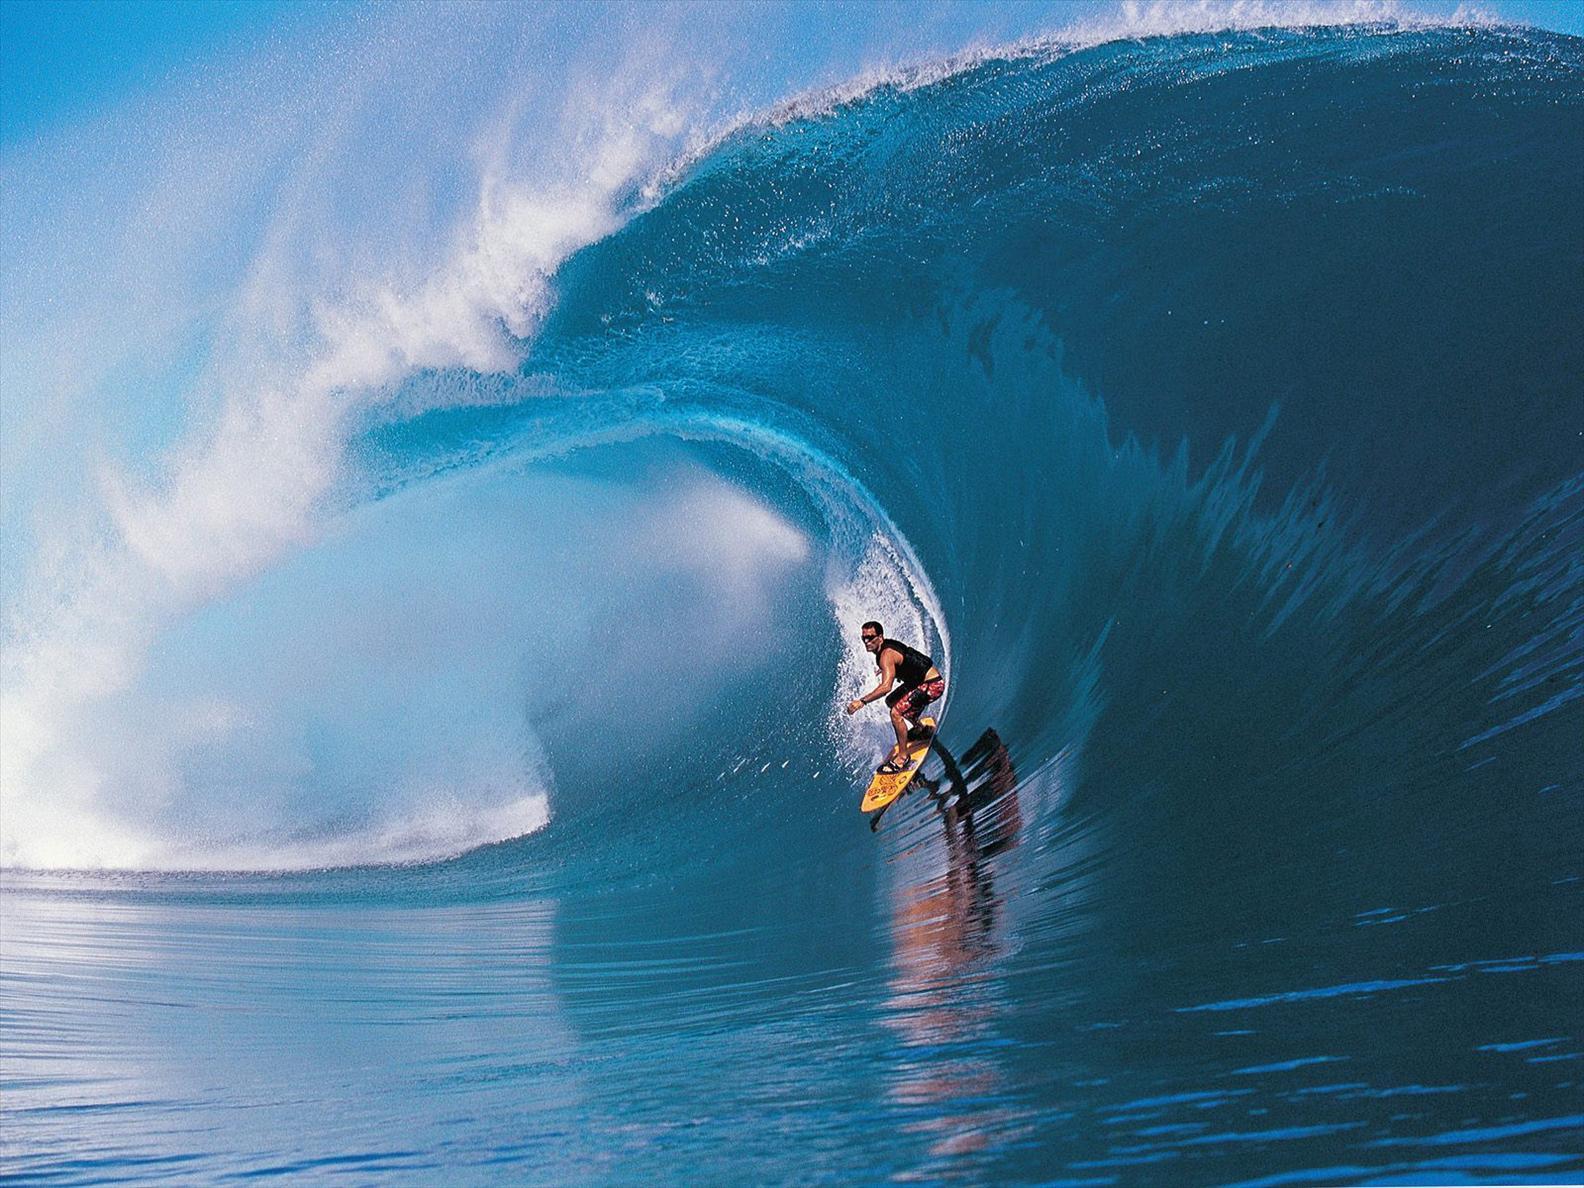 Gambar-gambar berselancar (surfing) di lautan